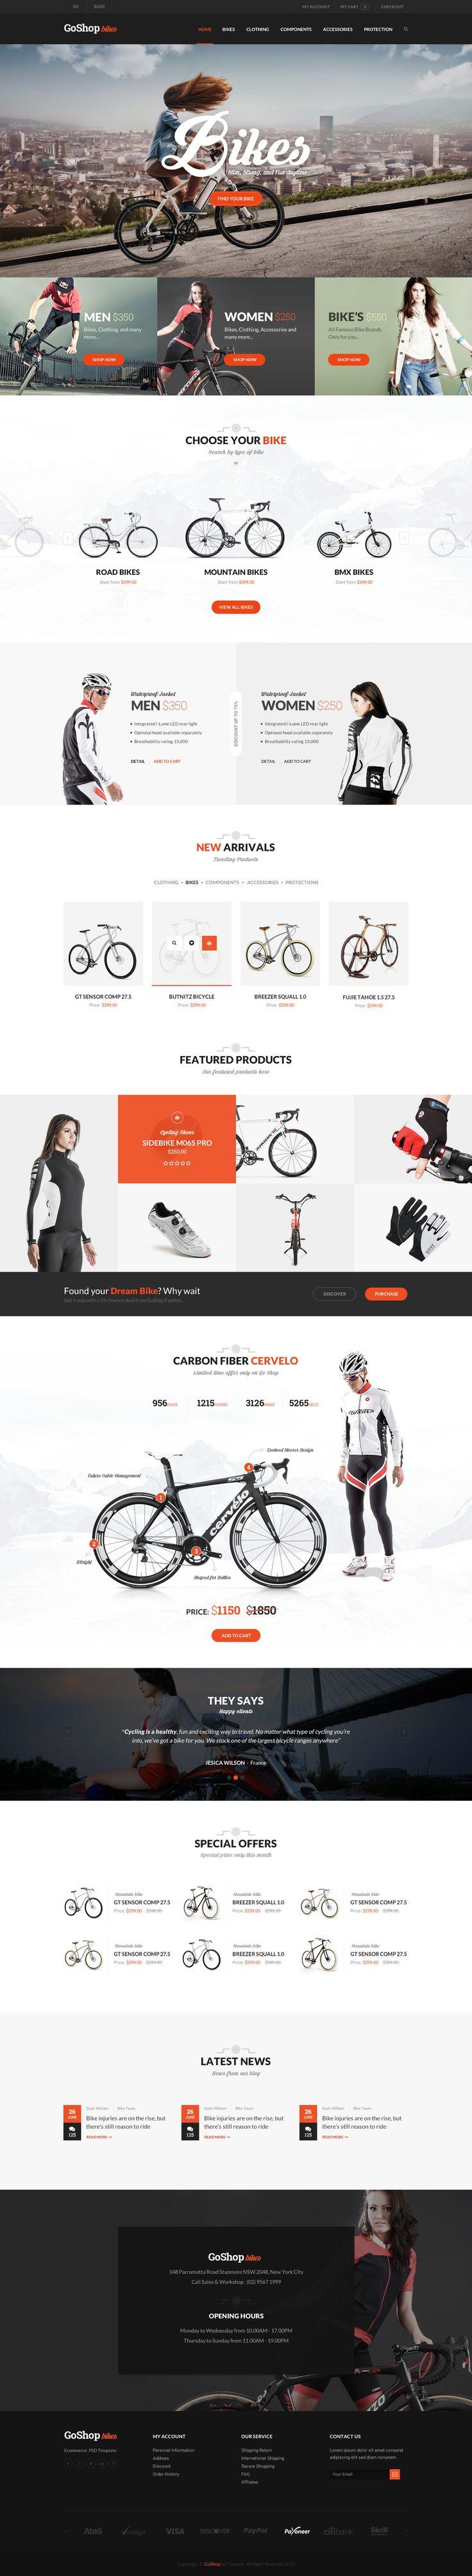 GoShop - eCommerce PSD Template - PSD Templates | ThemeForest